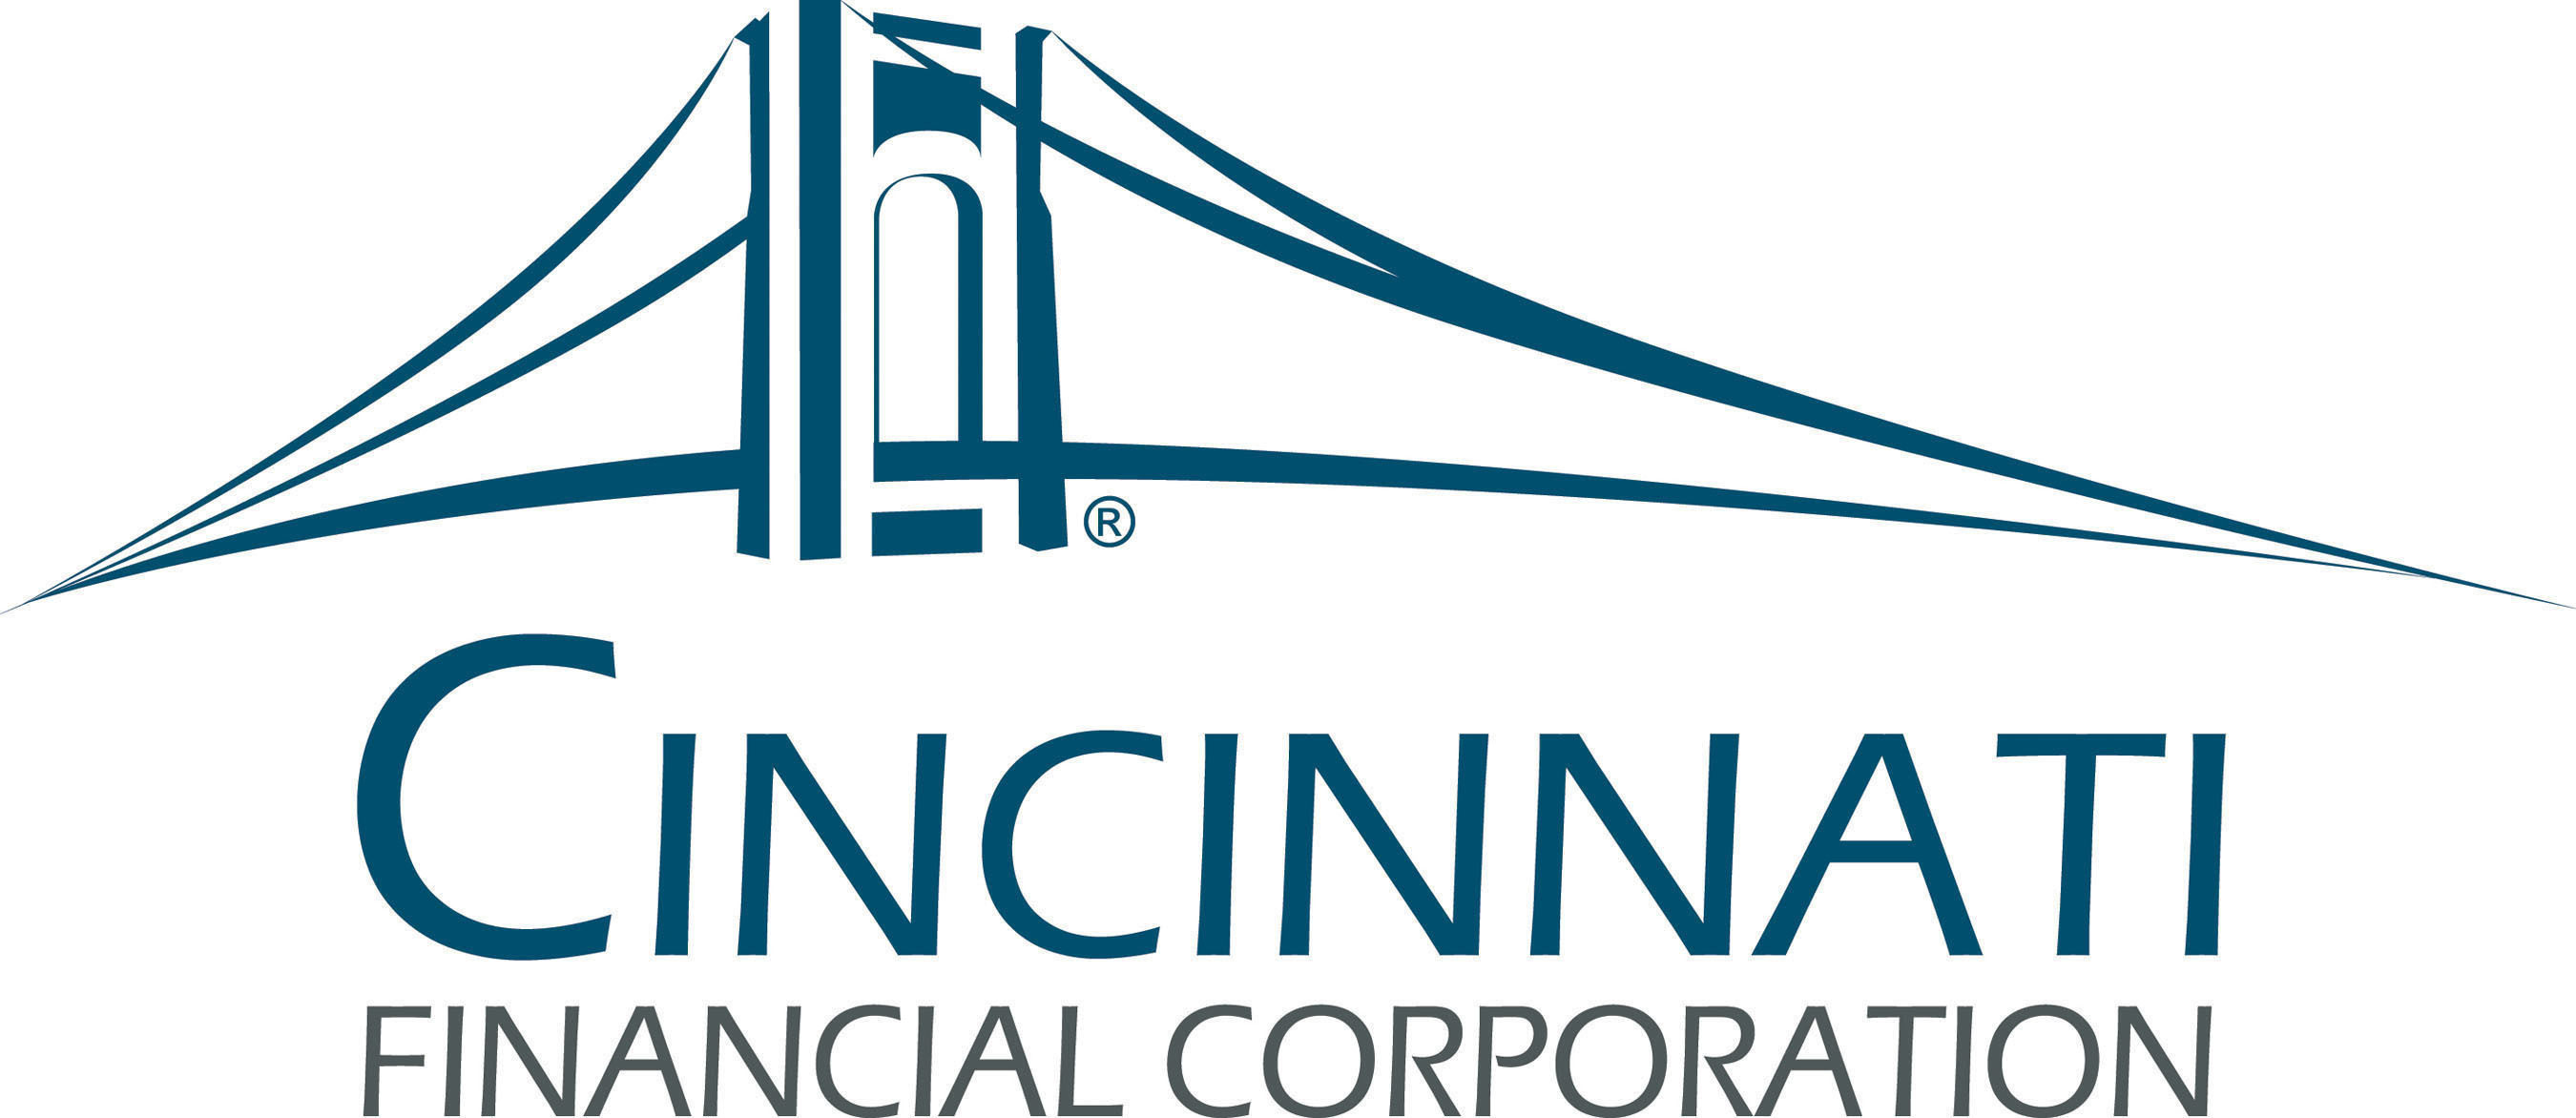 Cincinnati Financial Corporation logo.